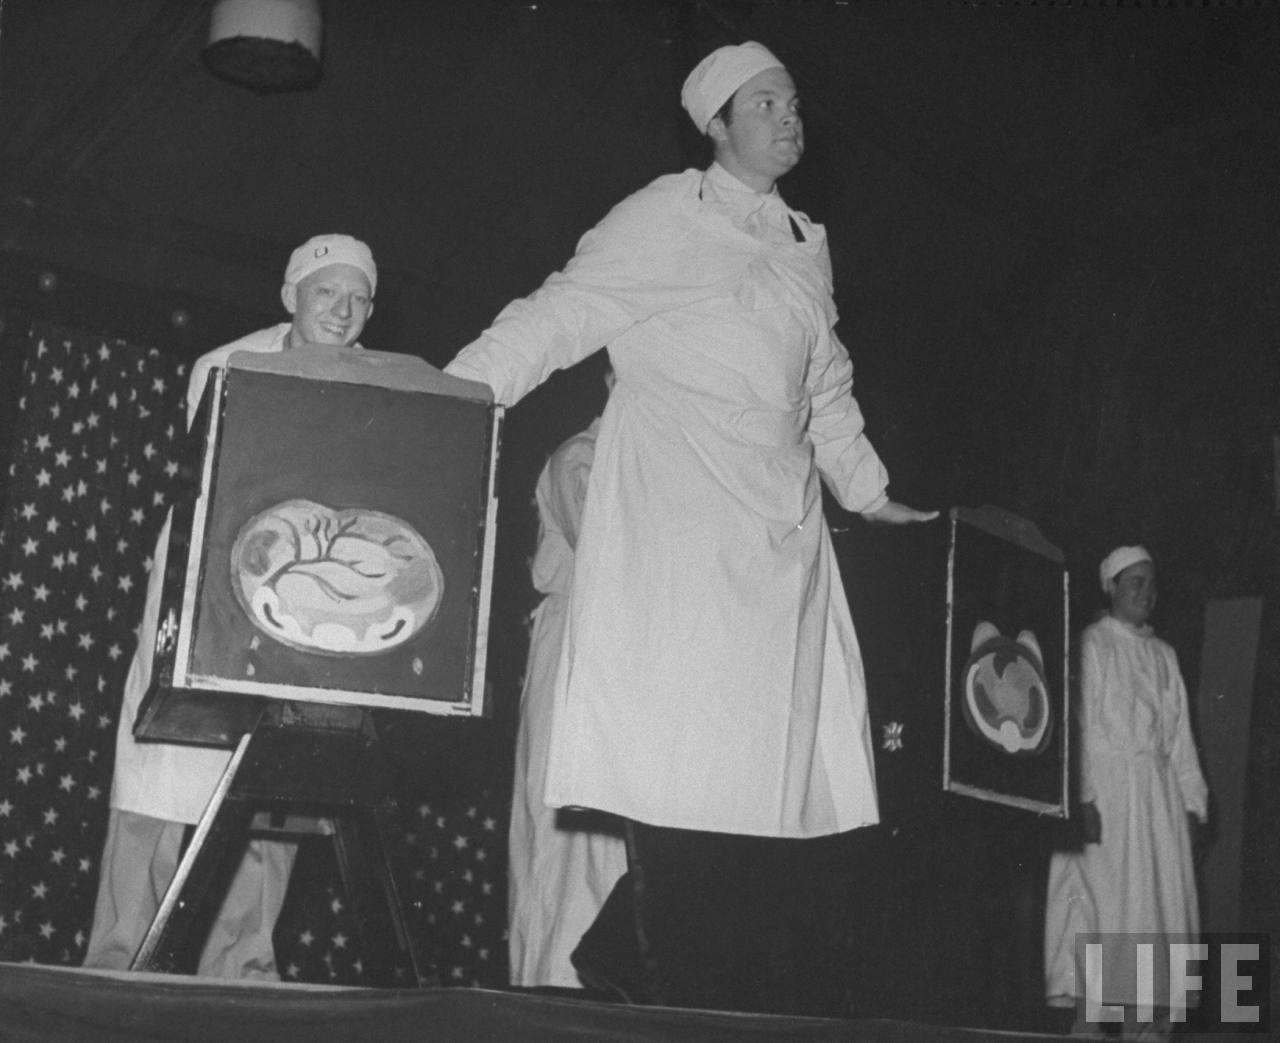 ... Twenties: Mercury Theater Wonder Show Starring Orson Welles - Part 8